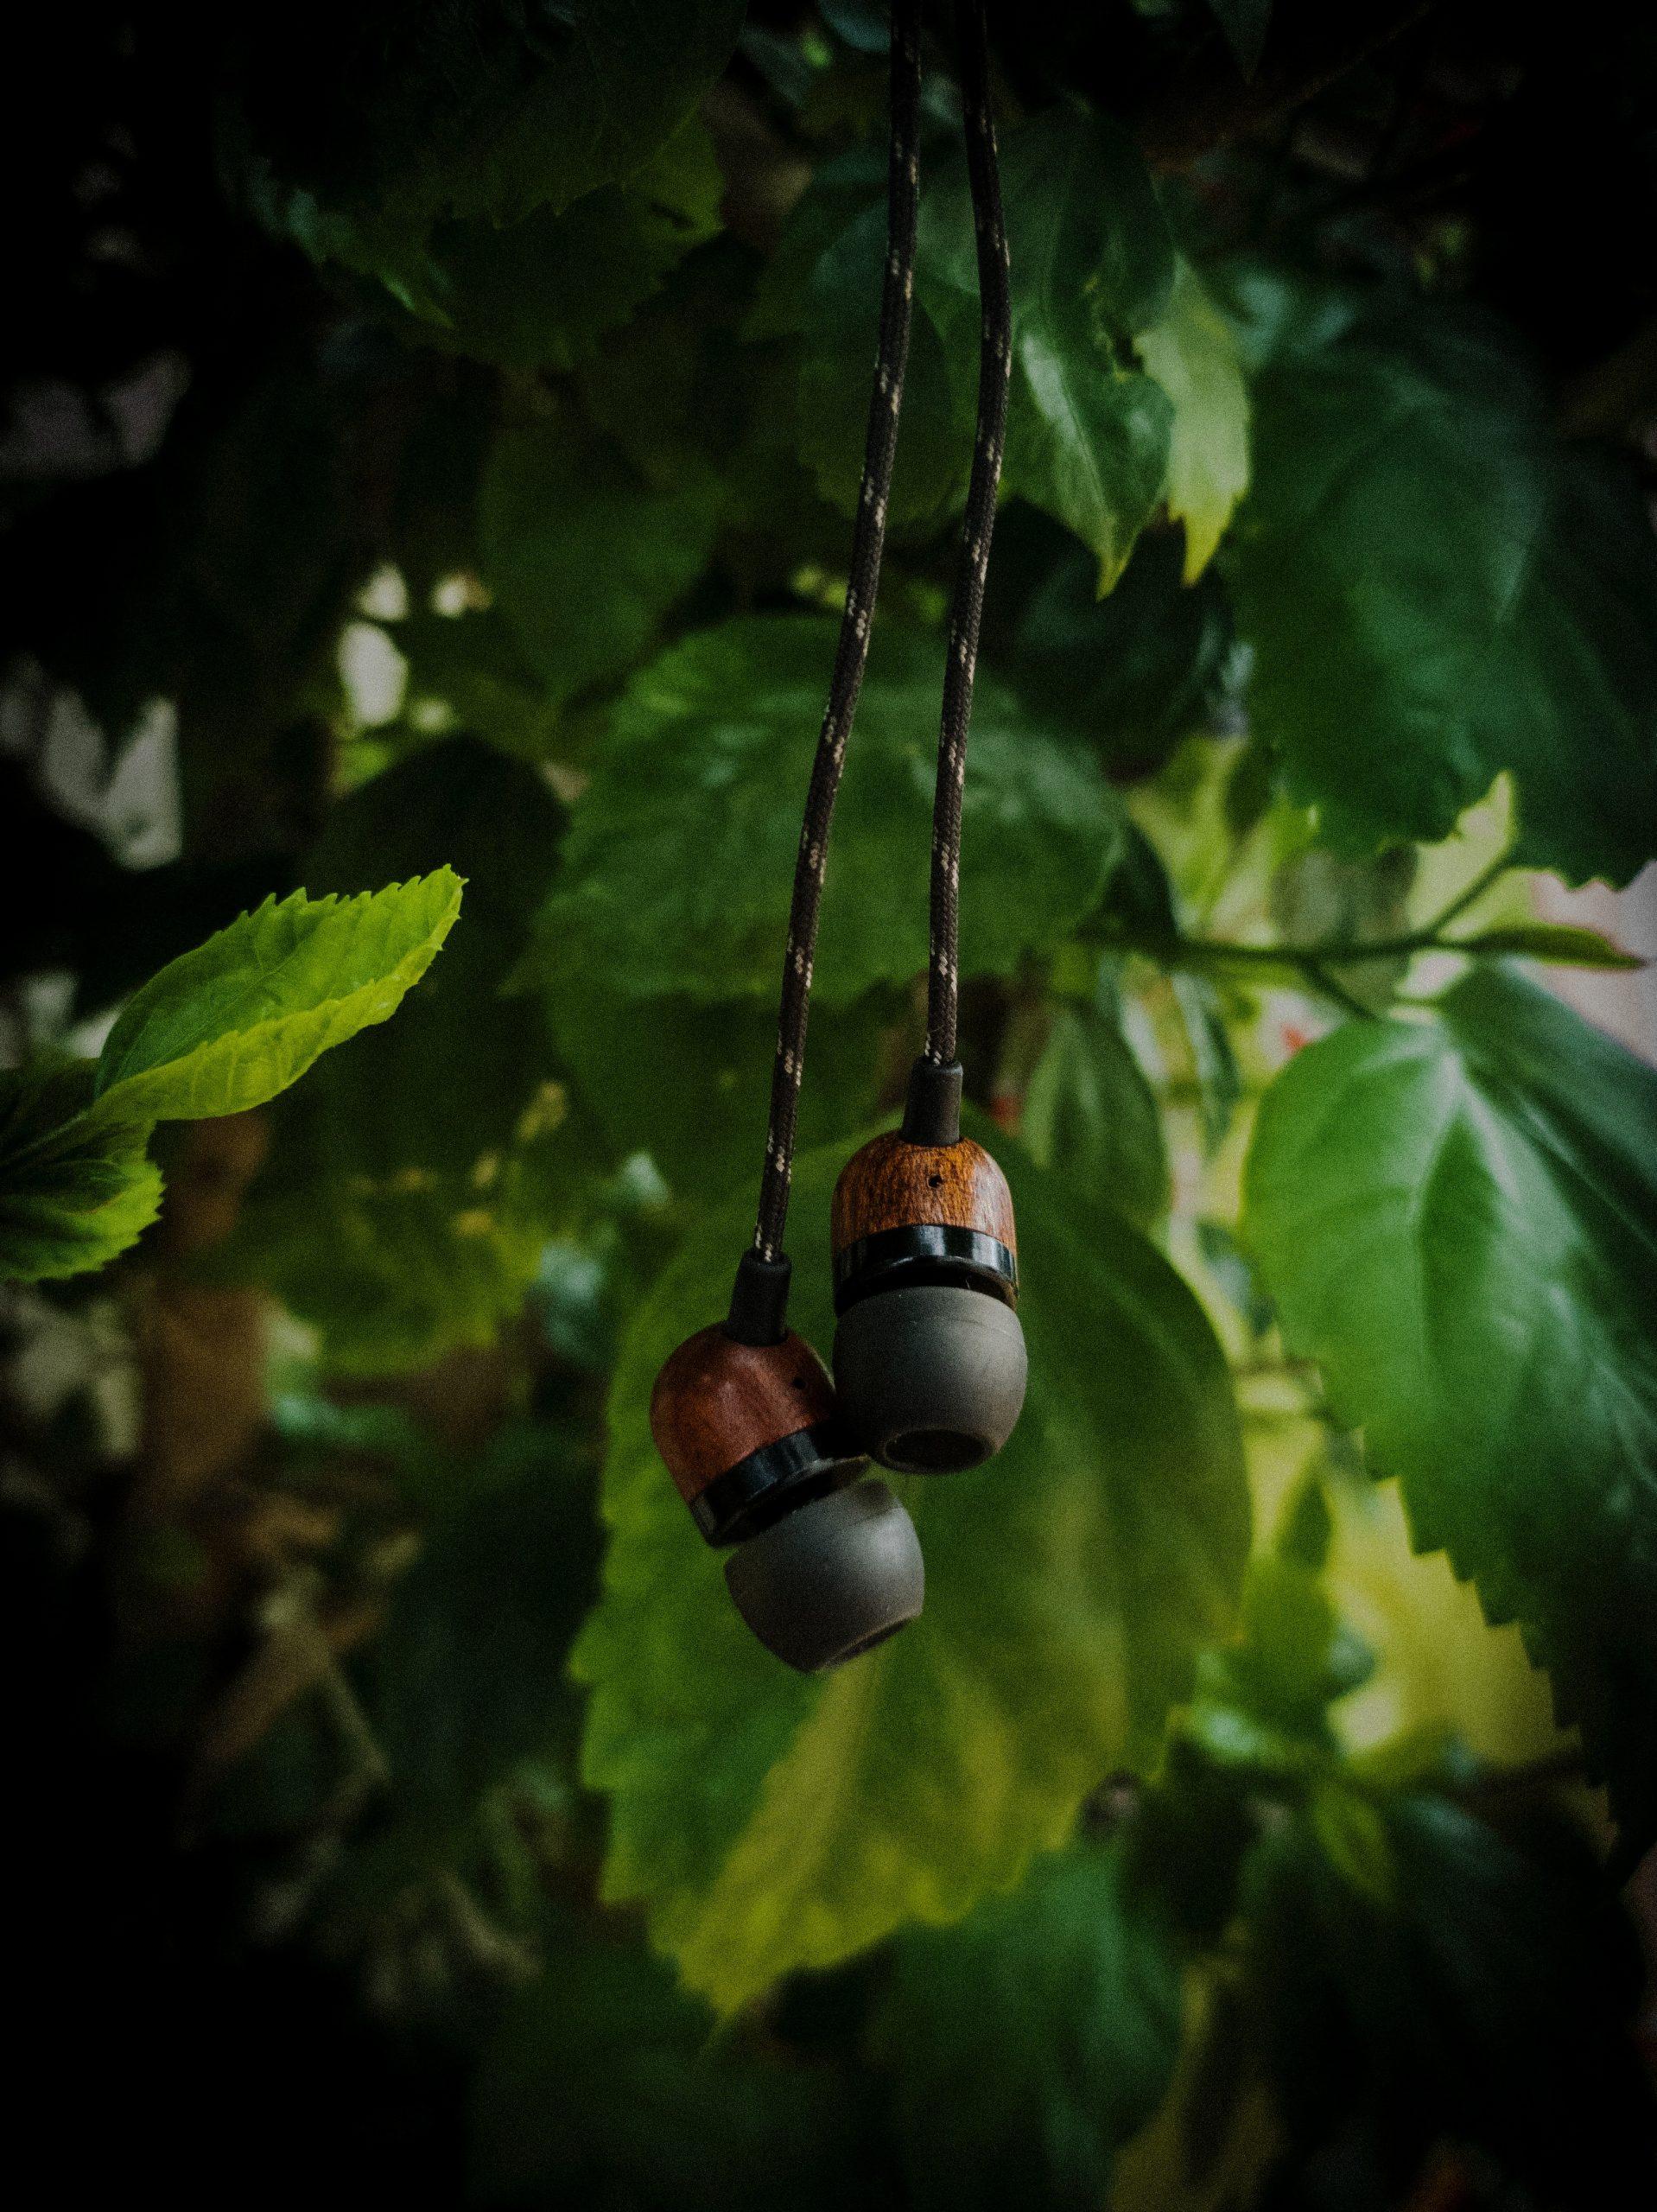 earphones hanging on a tree